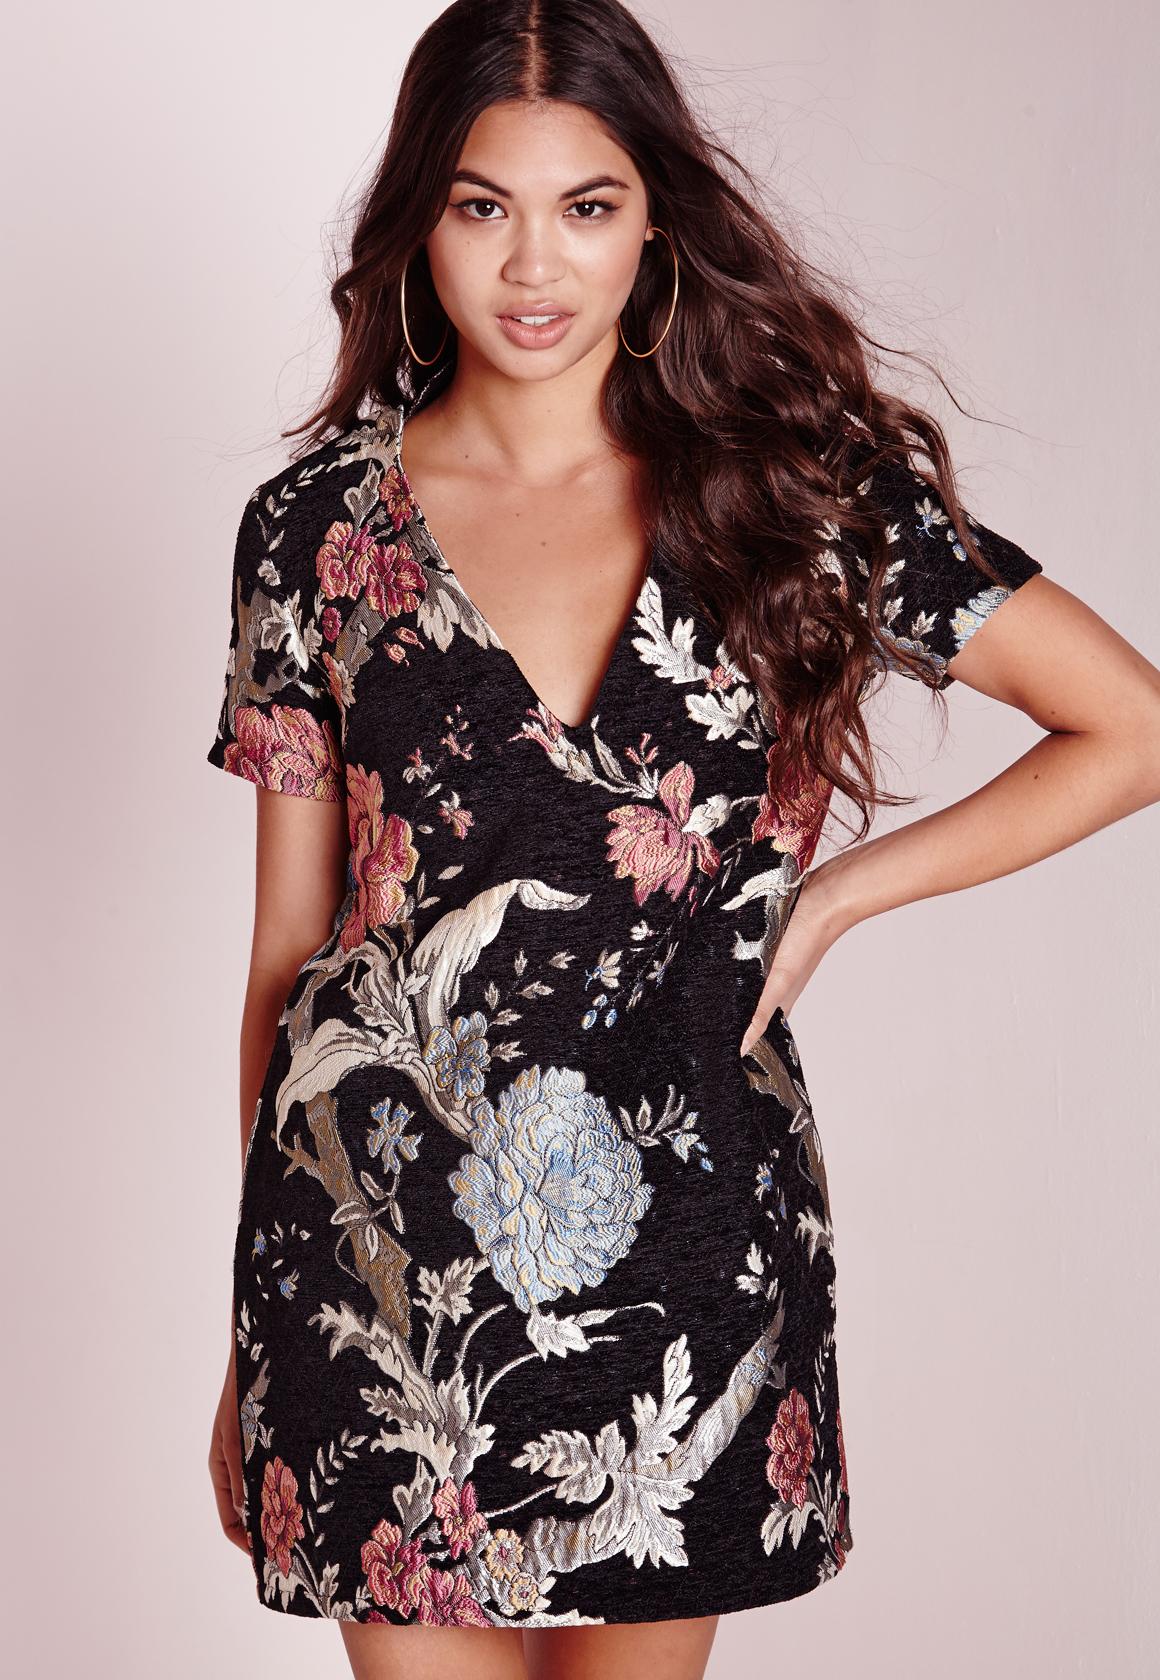 Lyst - Missguided Floral Brocade Plunge Shift Dress Black 69f91ee69